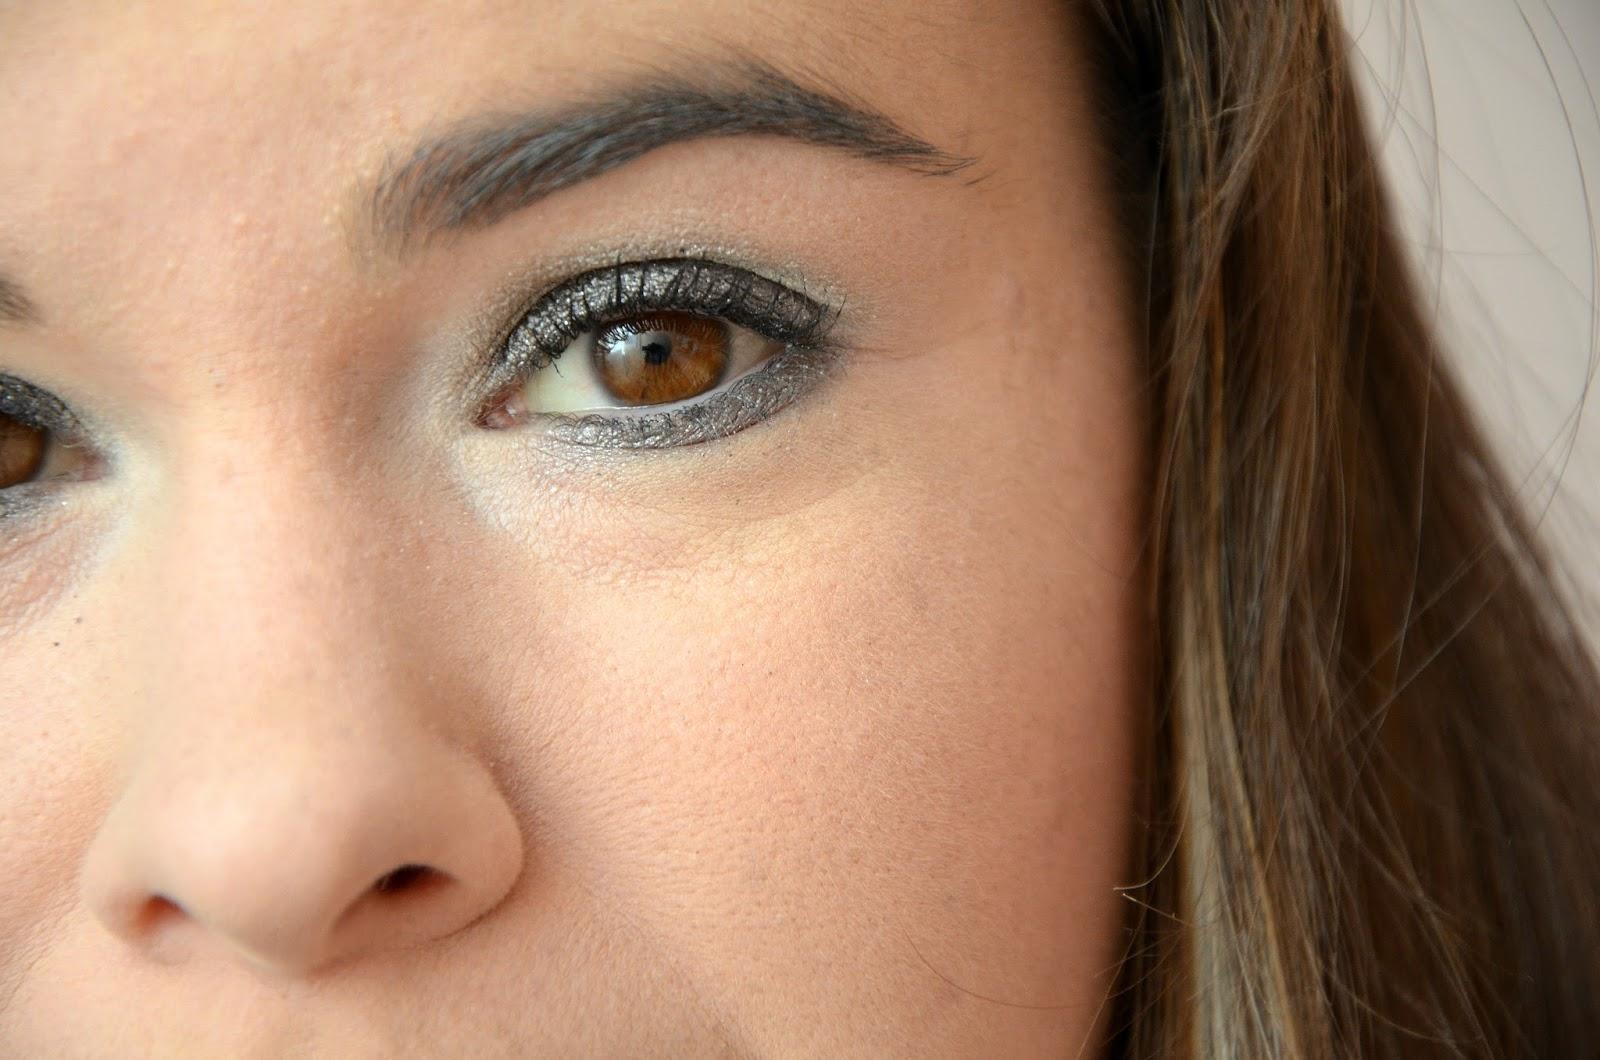 Vert-de-gris MSC 28 novembre 2016 open eyes